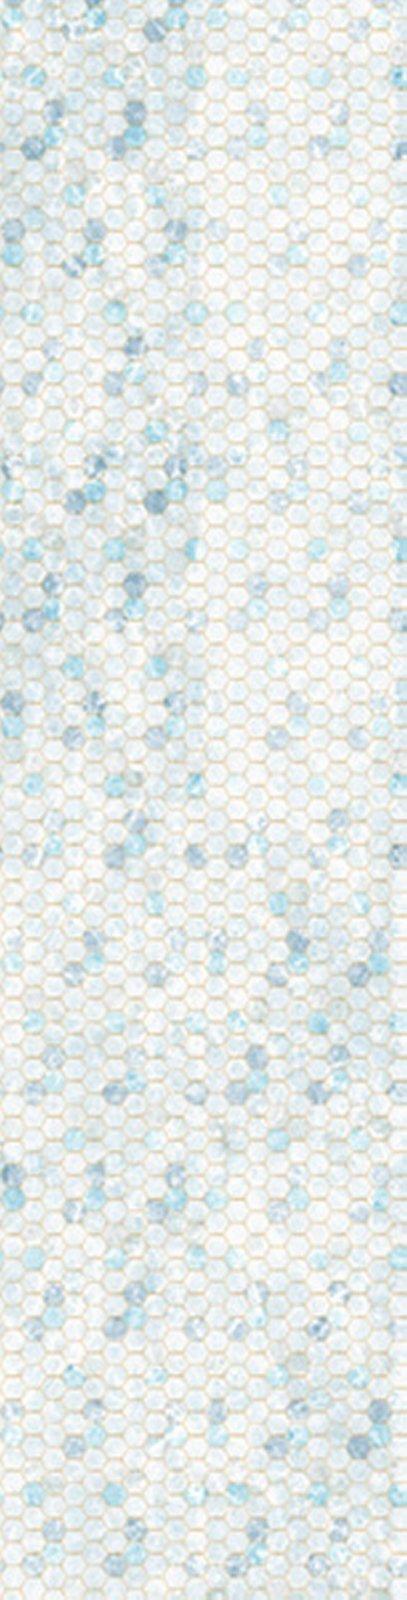 Backsplash - Ice - By Hoffman Fabrics